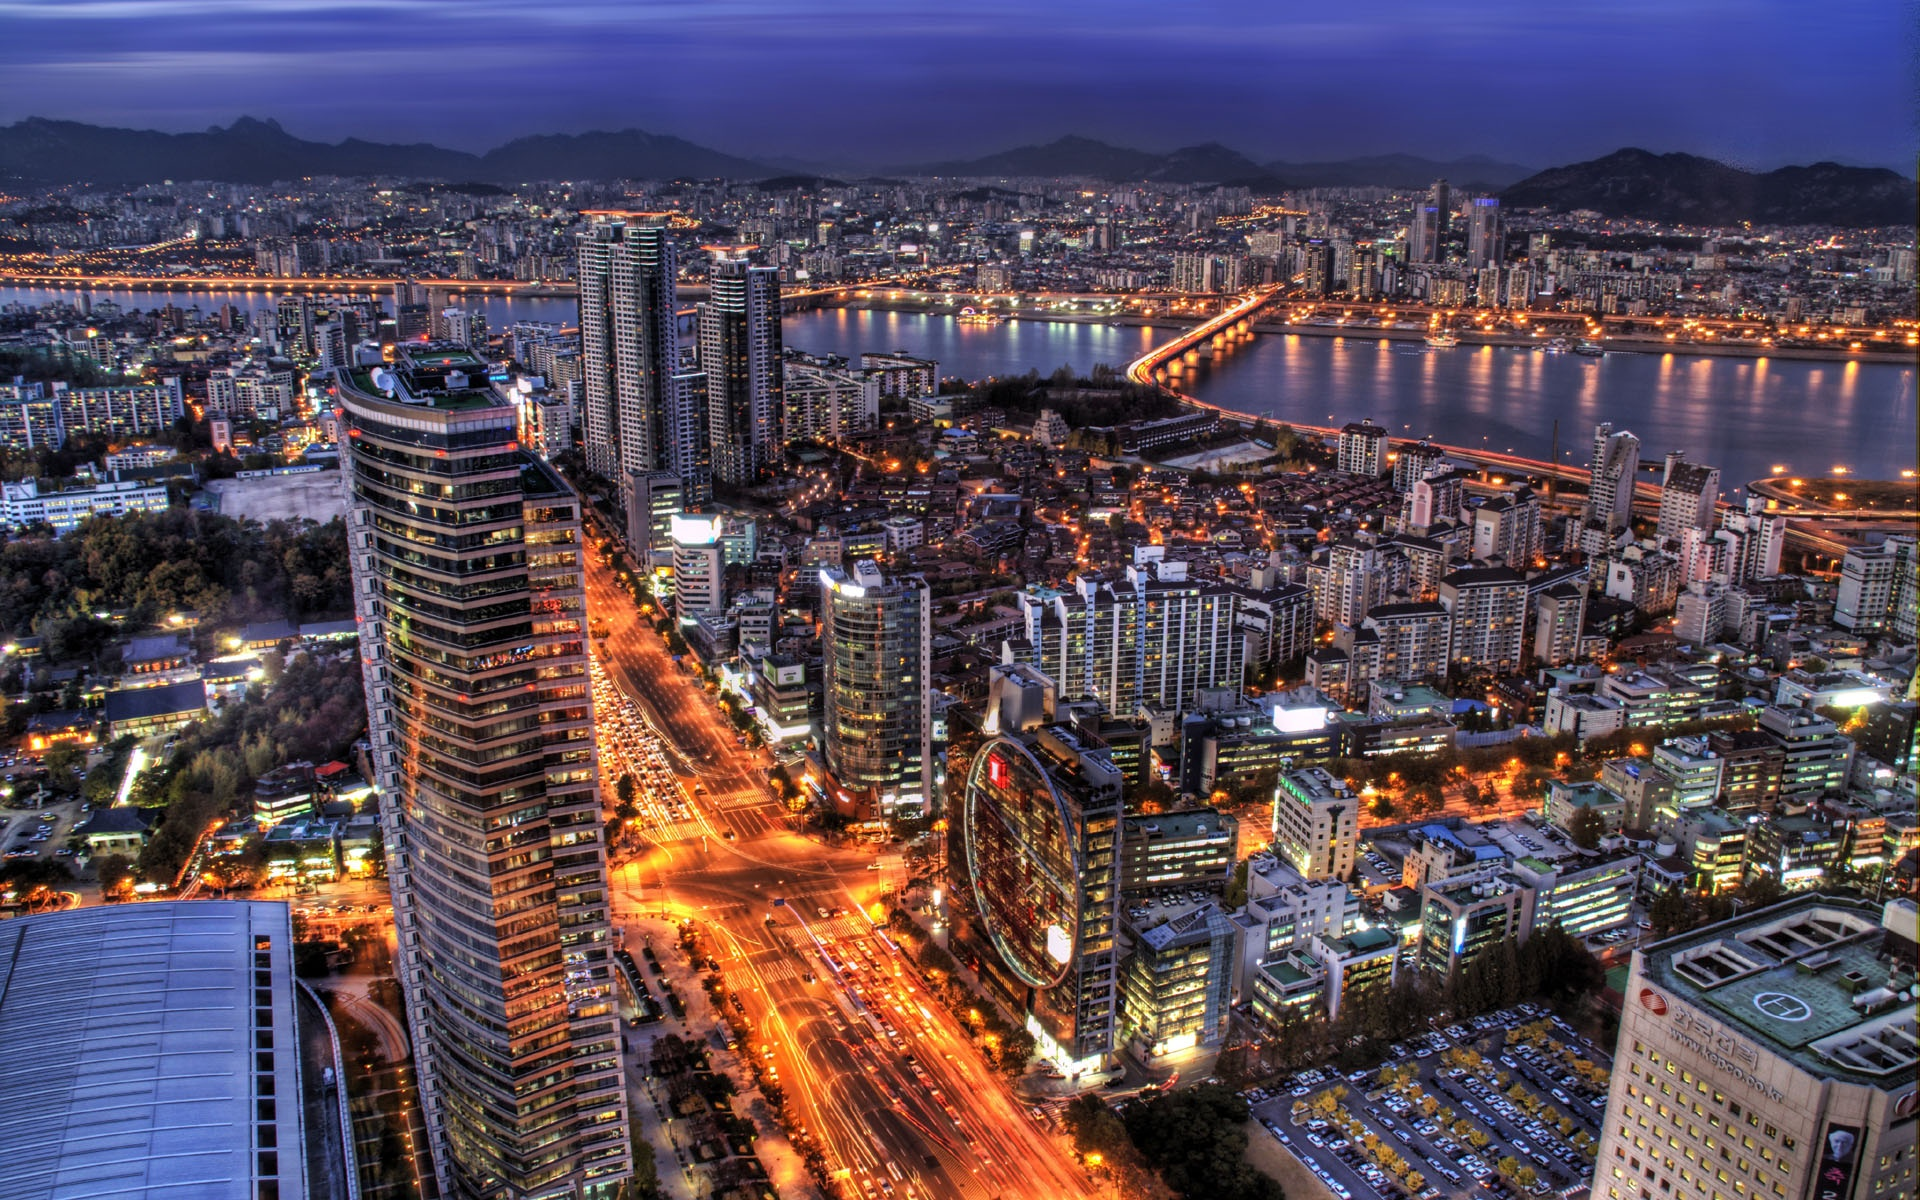 lighting-night-seoul-south-korea